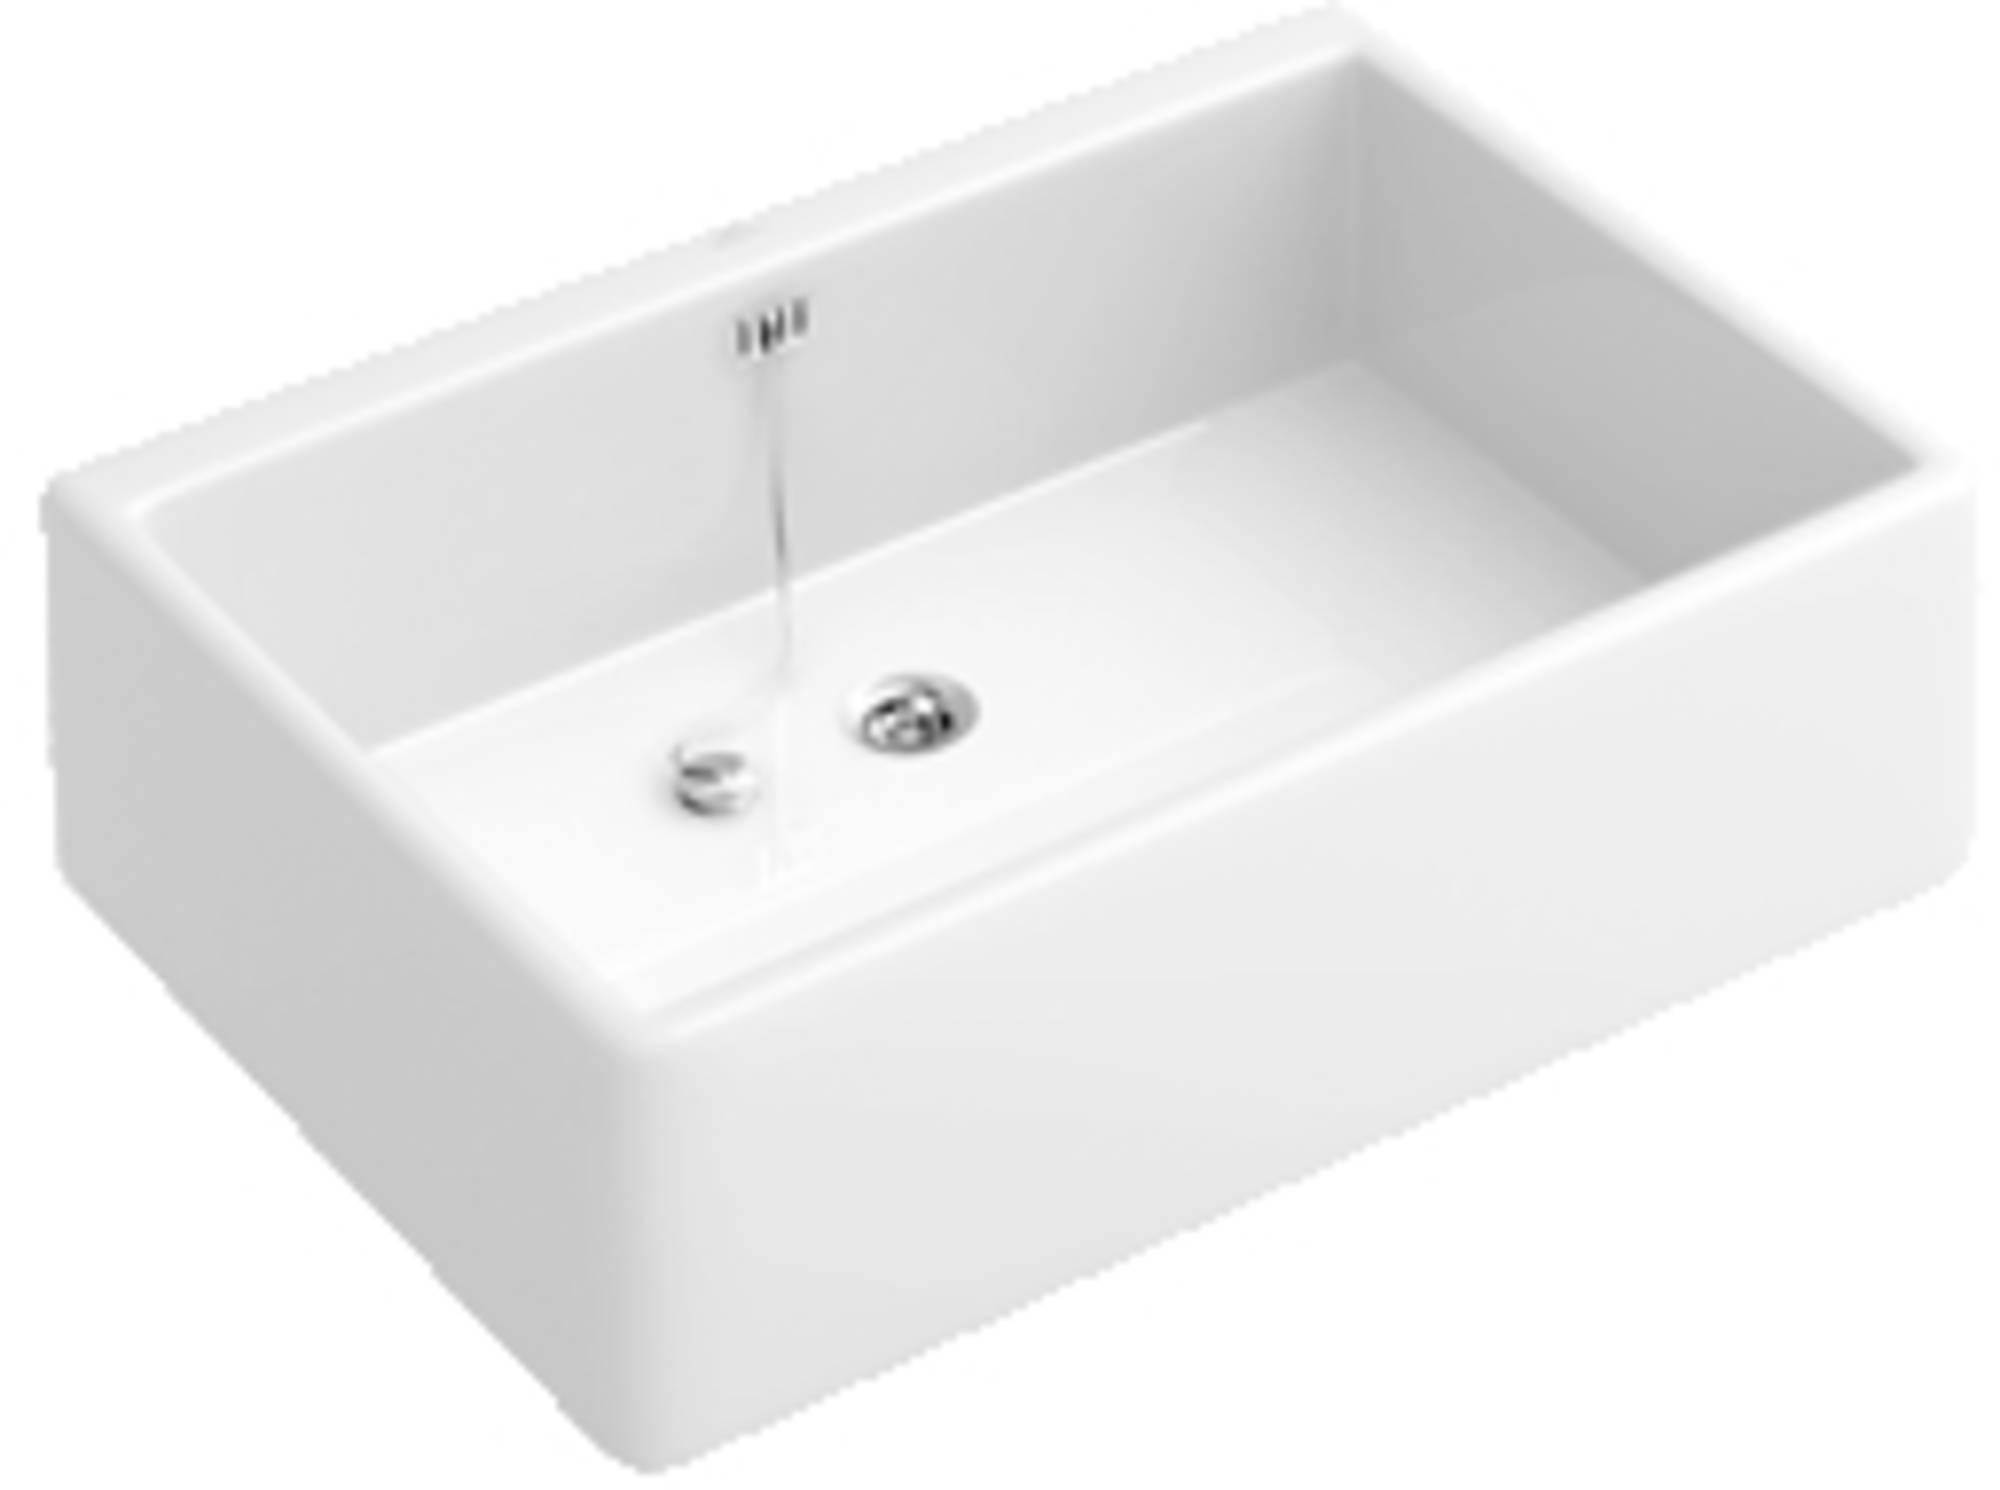 VILLEROY & BOCH O.NOVO-OMNIA PRO spoelbak 50x40 cm. ceramicplus WIT (632100R1)